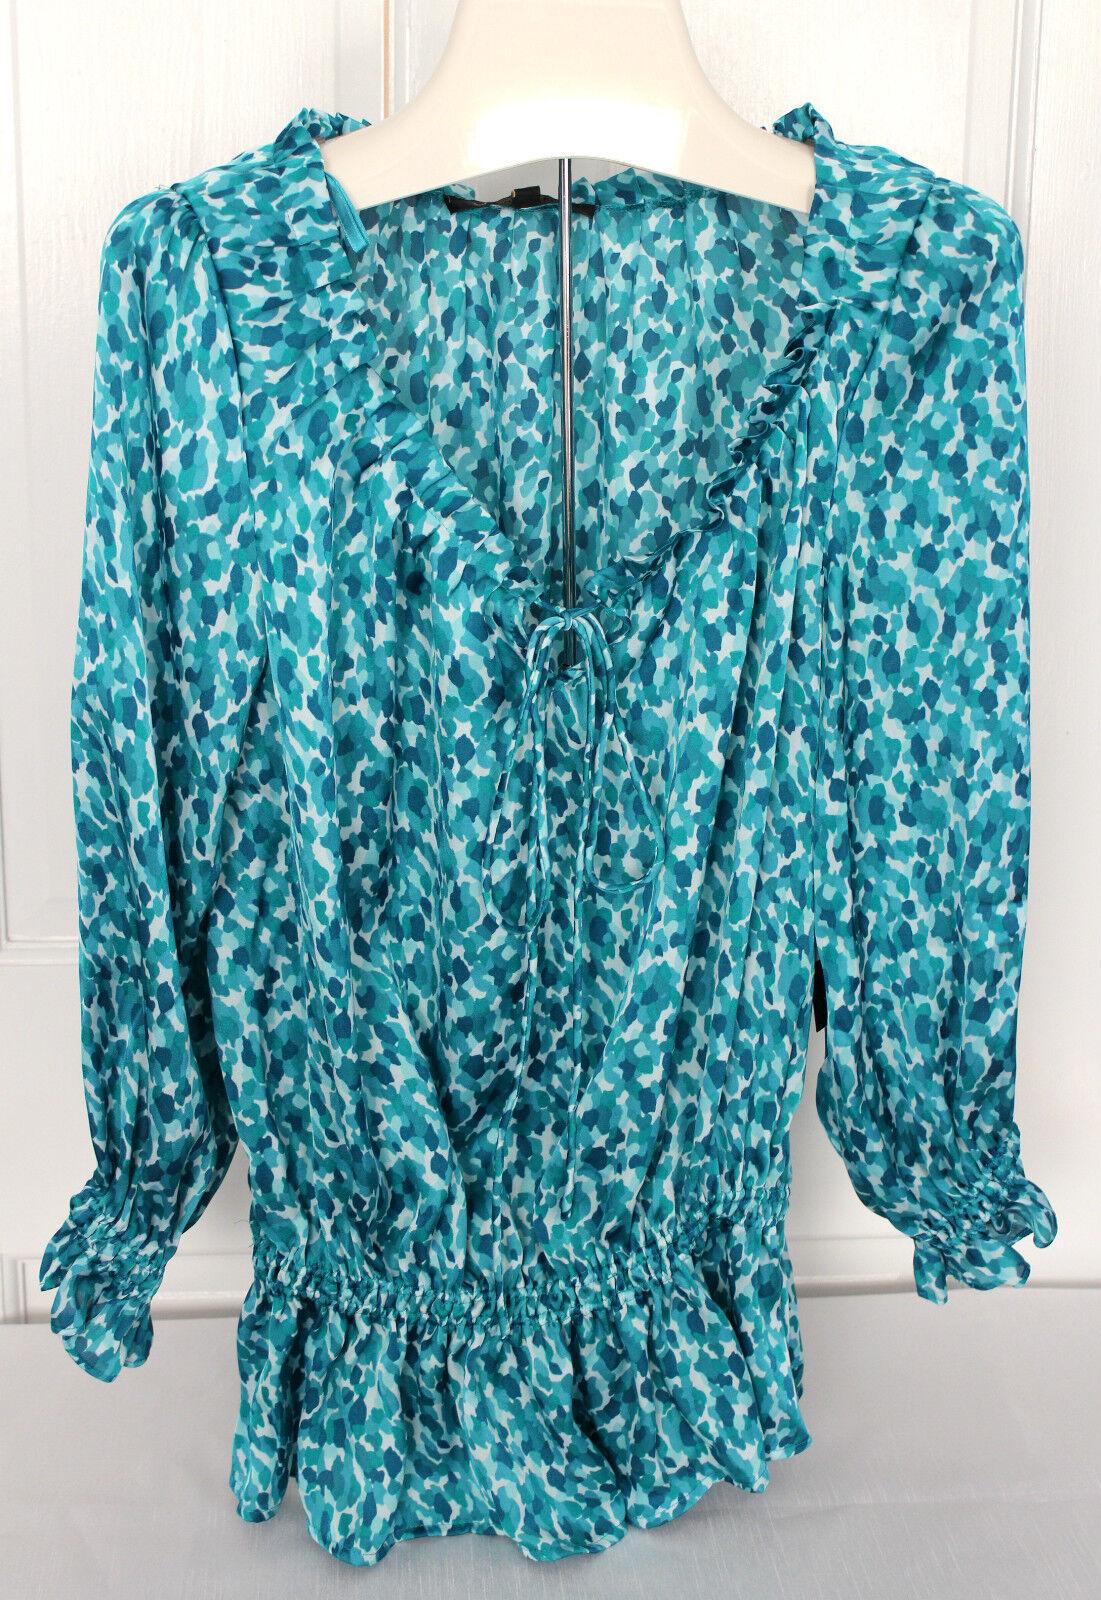 NWT Cynthia Steffe True Teal Aqua Blau Weiß Designer Blouse Sexy Airy Top XS